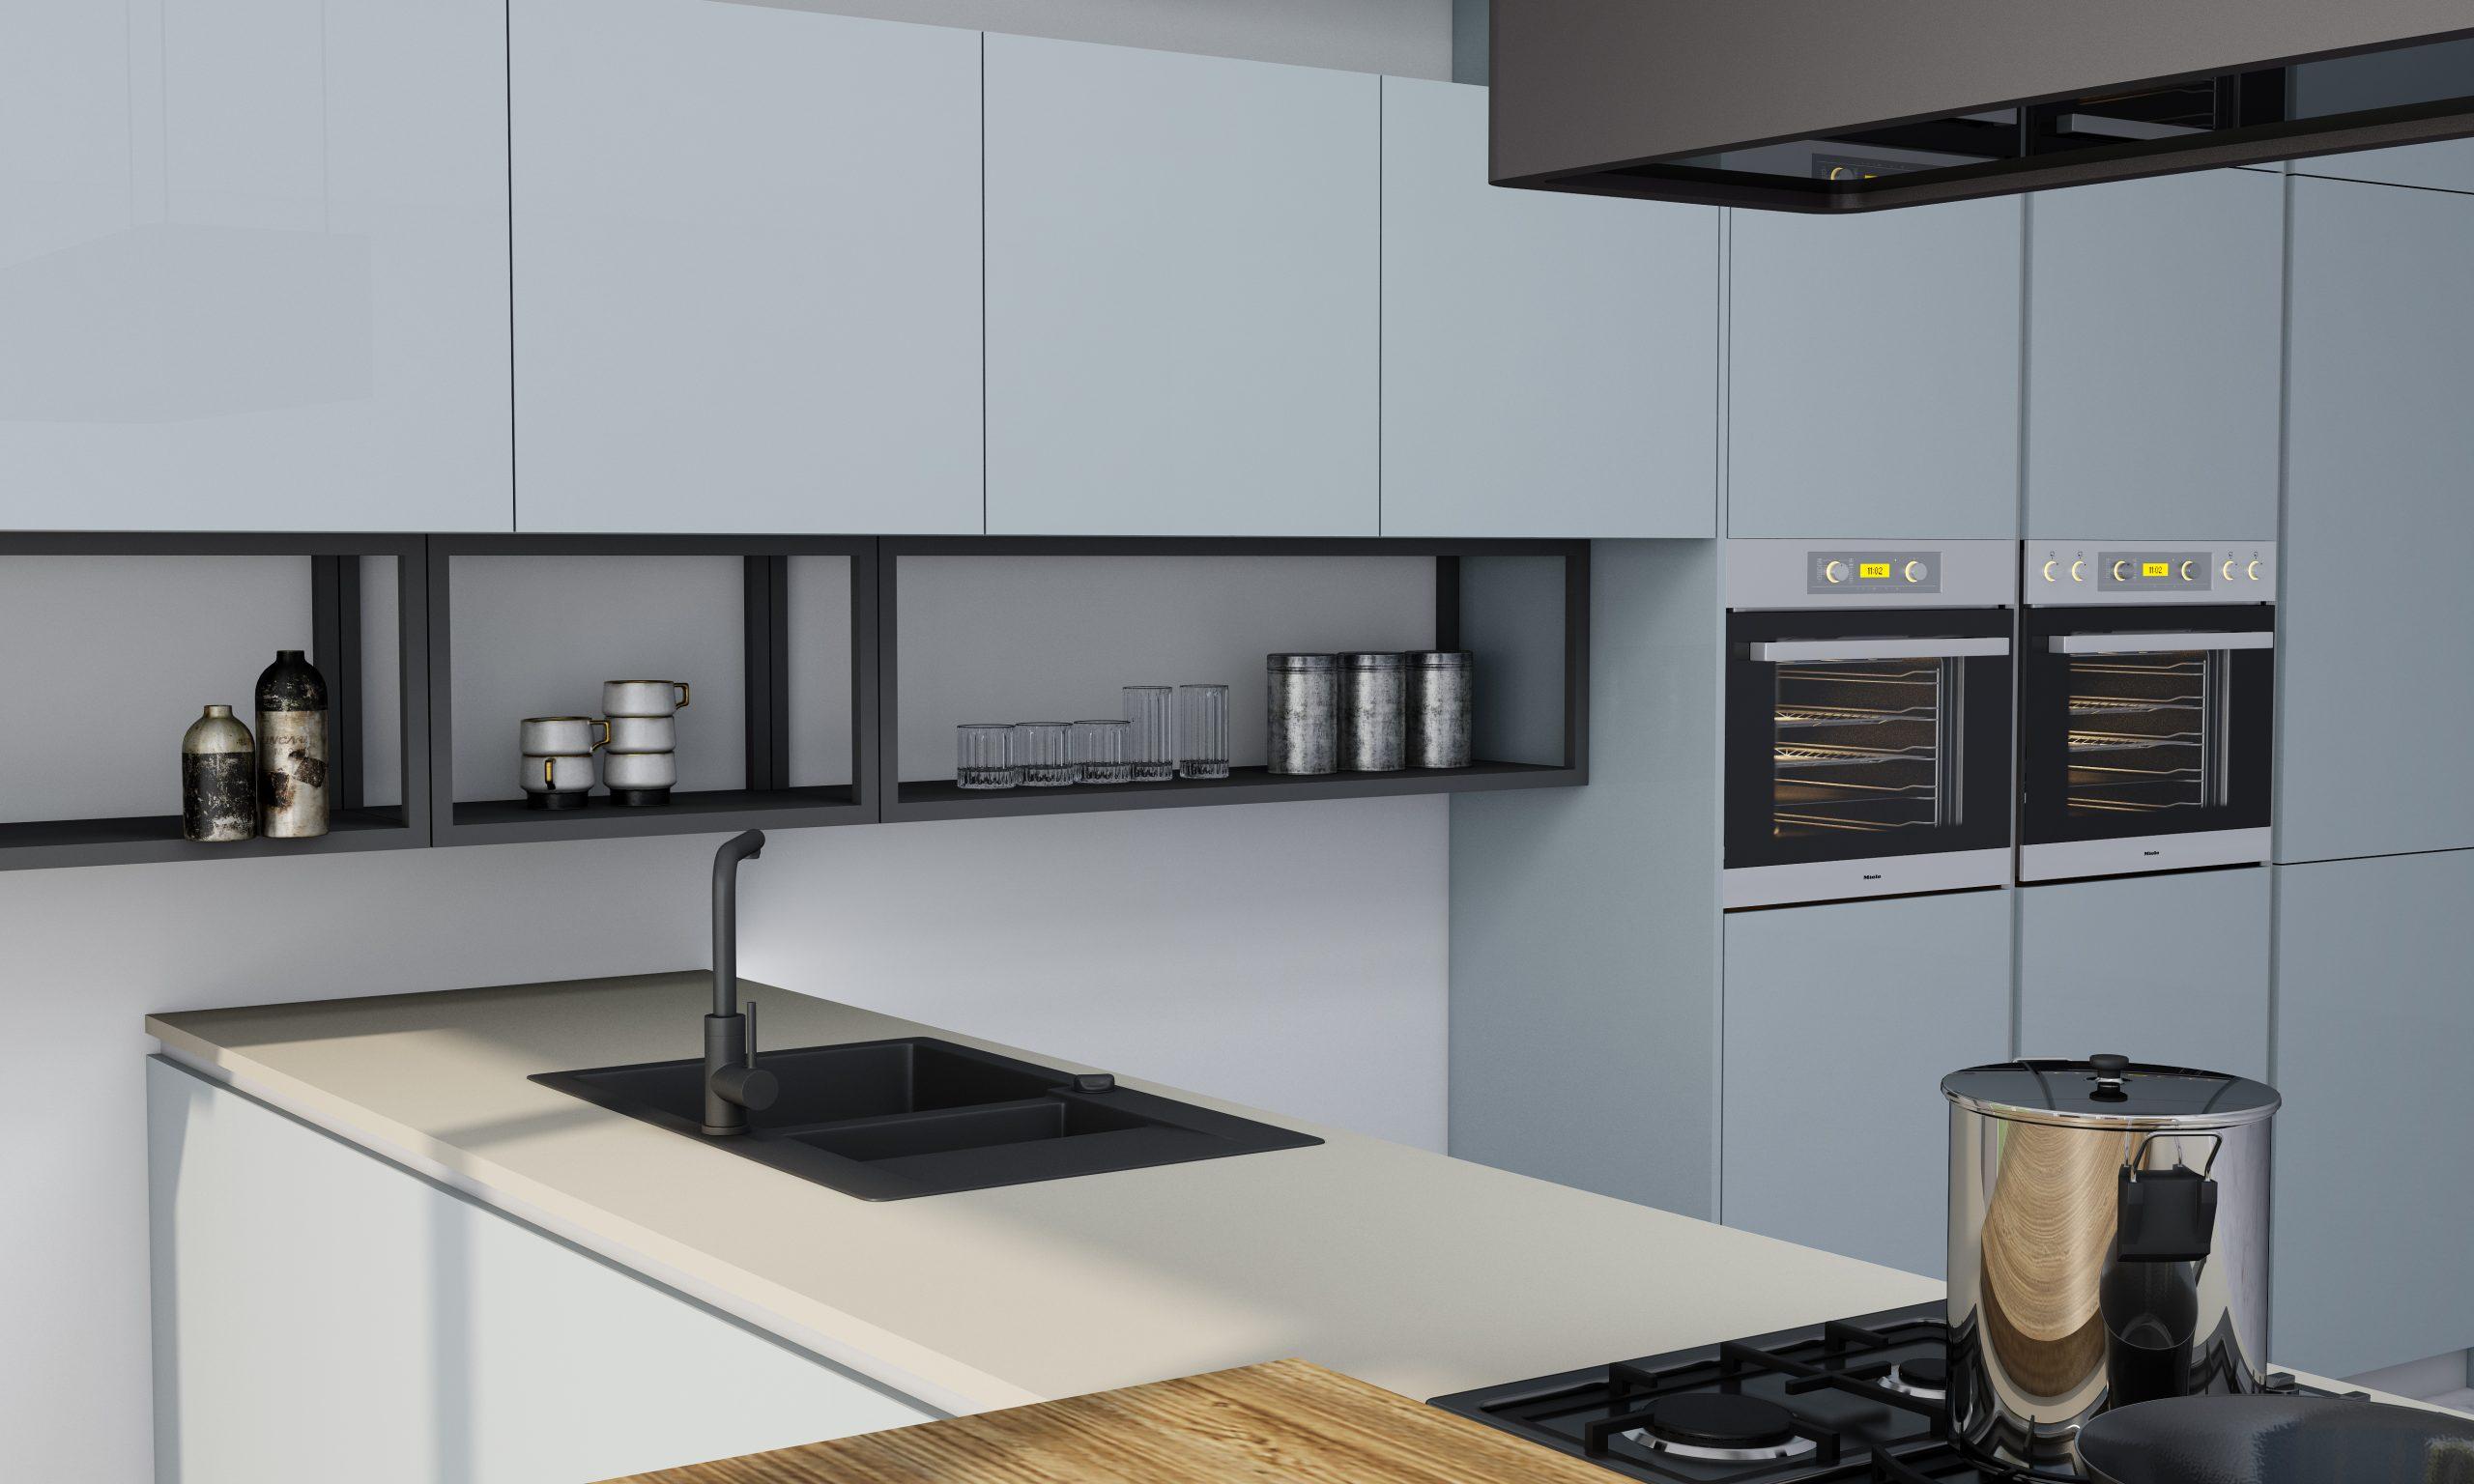 Premiumline Kitchen in Aluminium Handleless Profile With Dining Area Finish Metallic Blue Gloss Acrylic